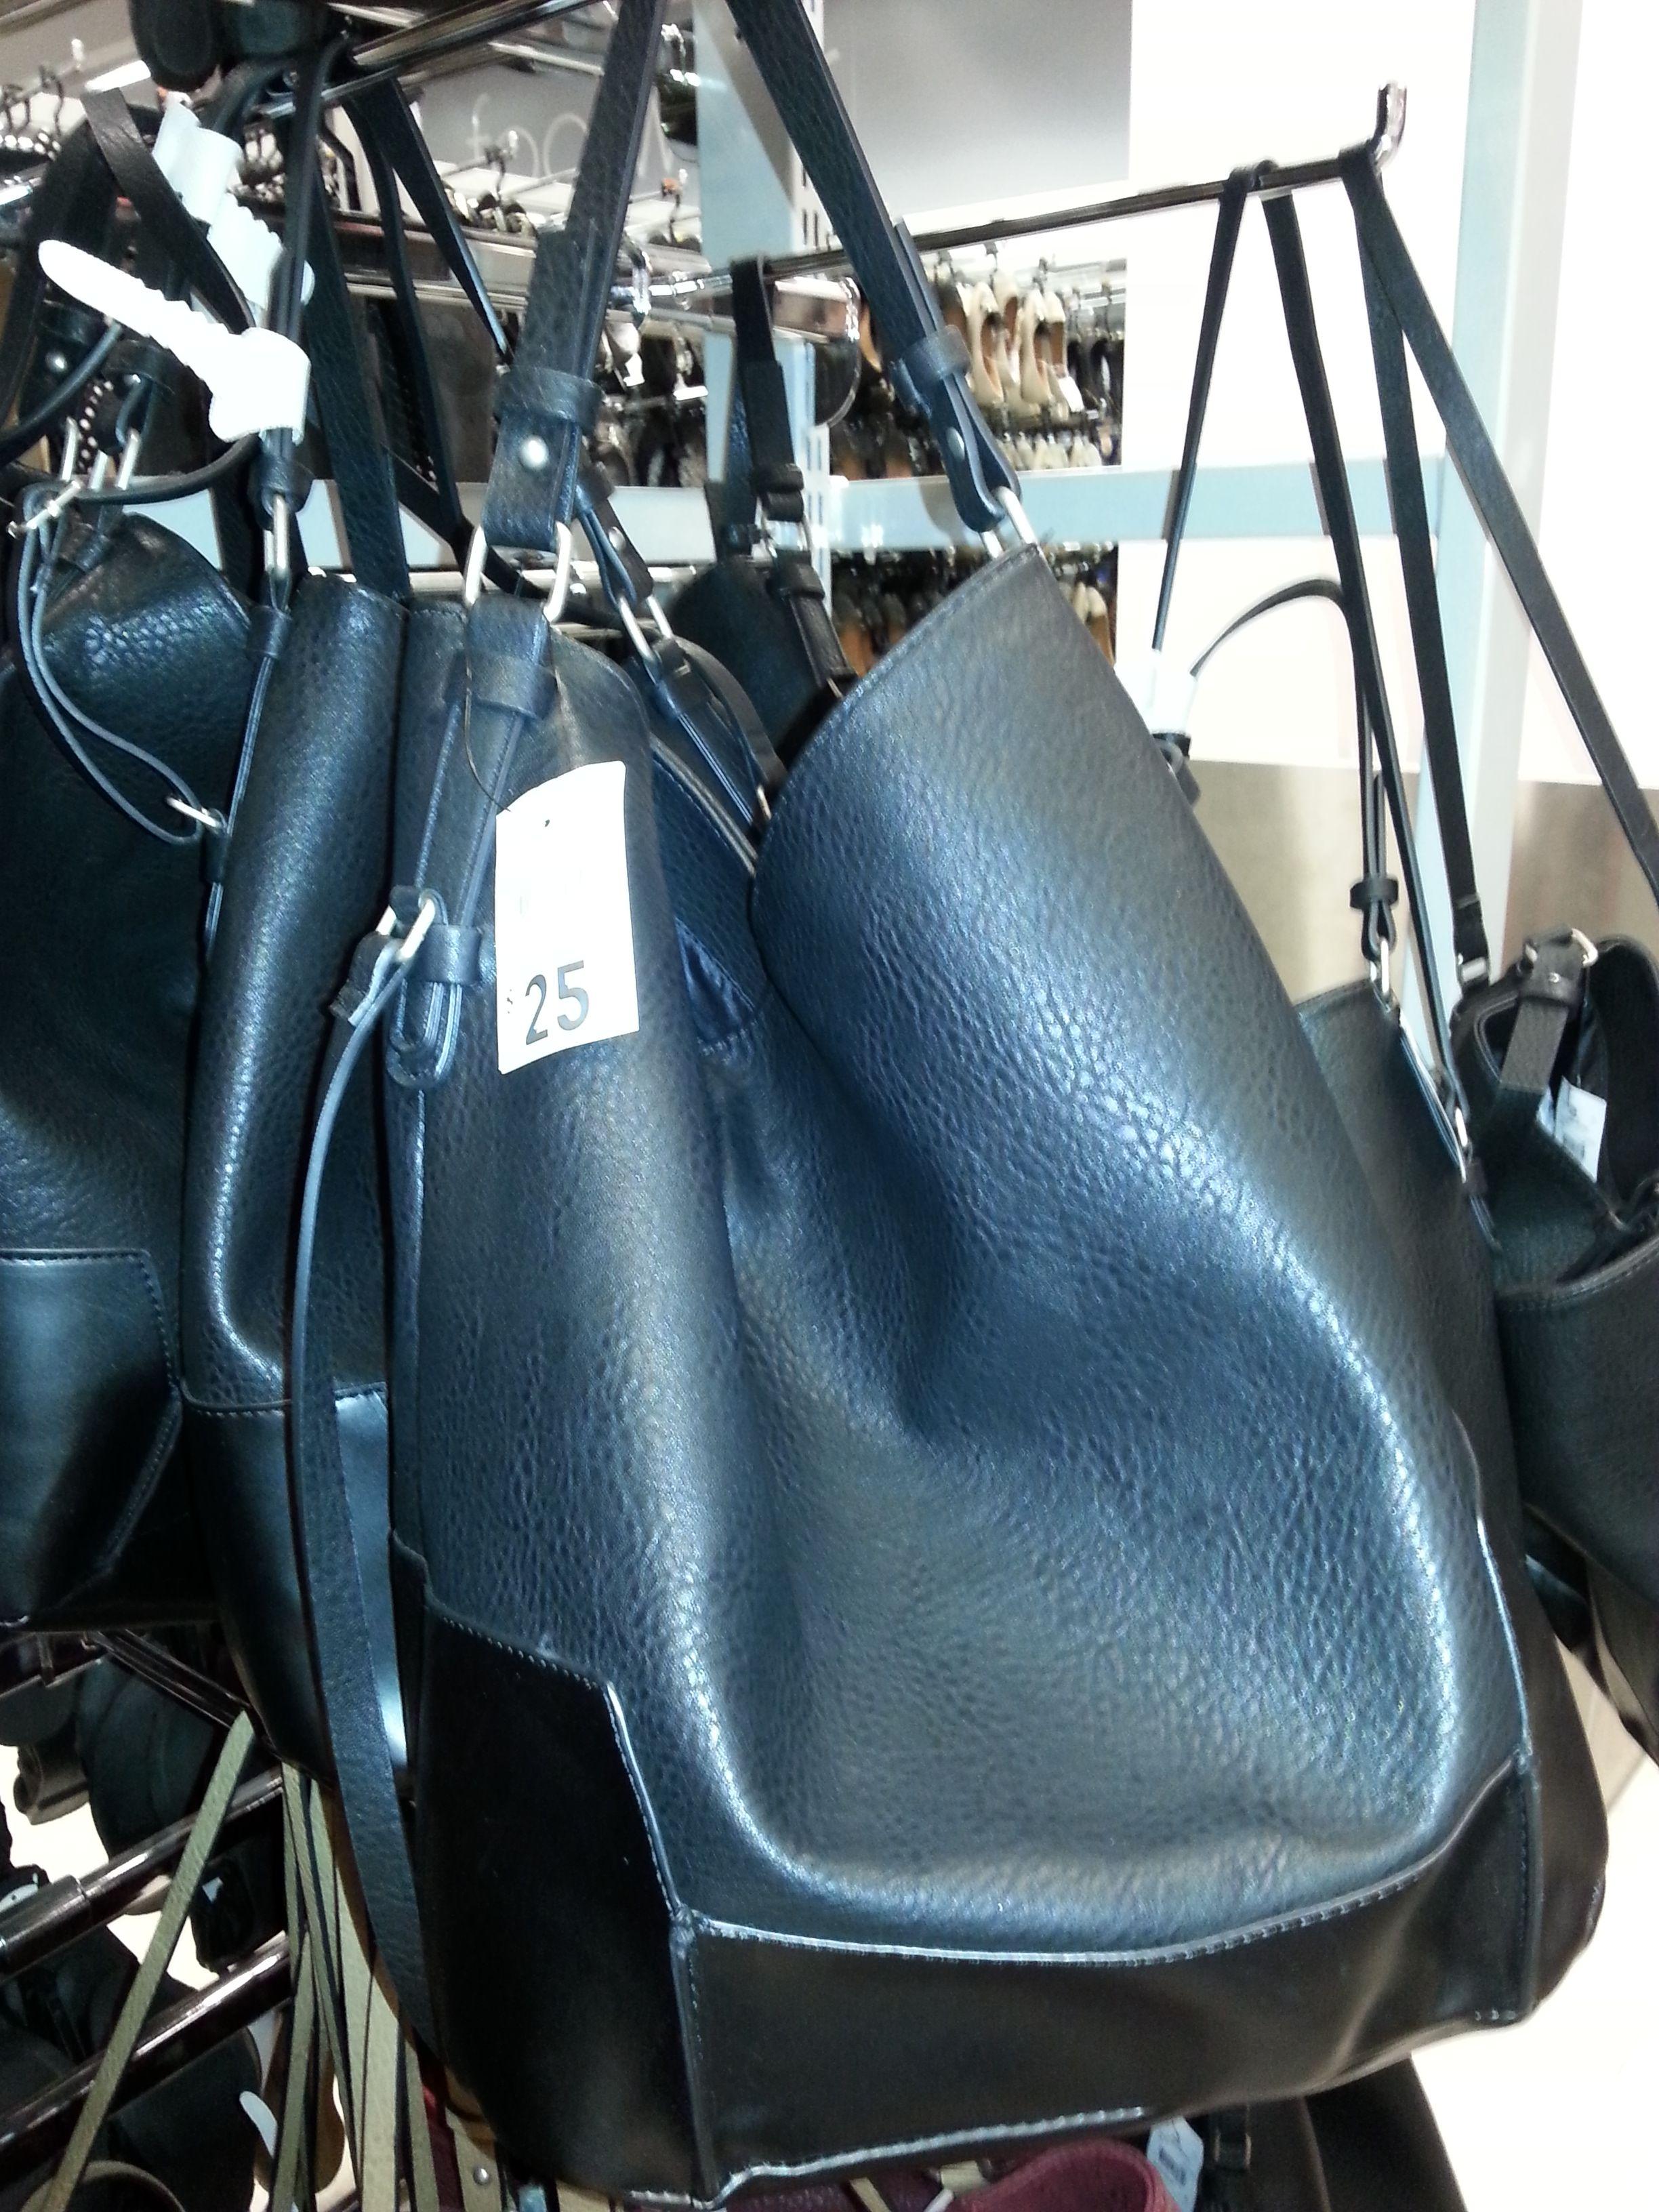 fd92d5260b Duffle Bag With Wheels Kmart